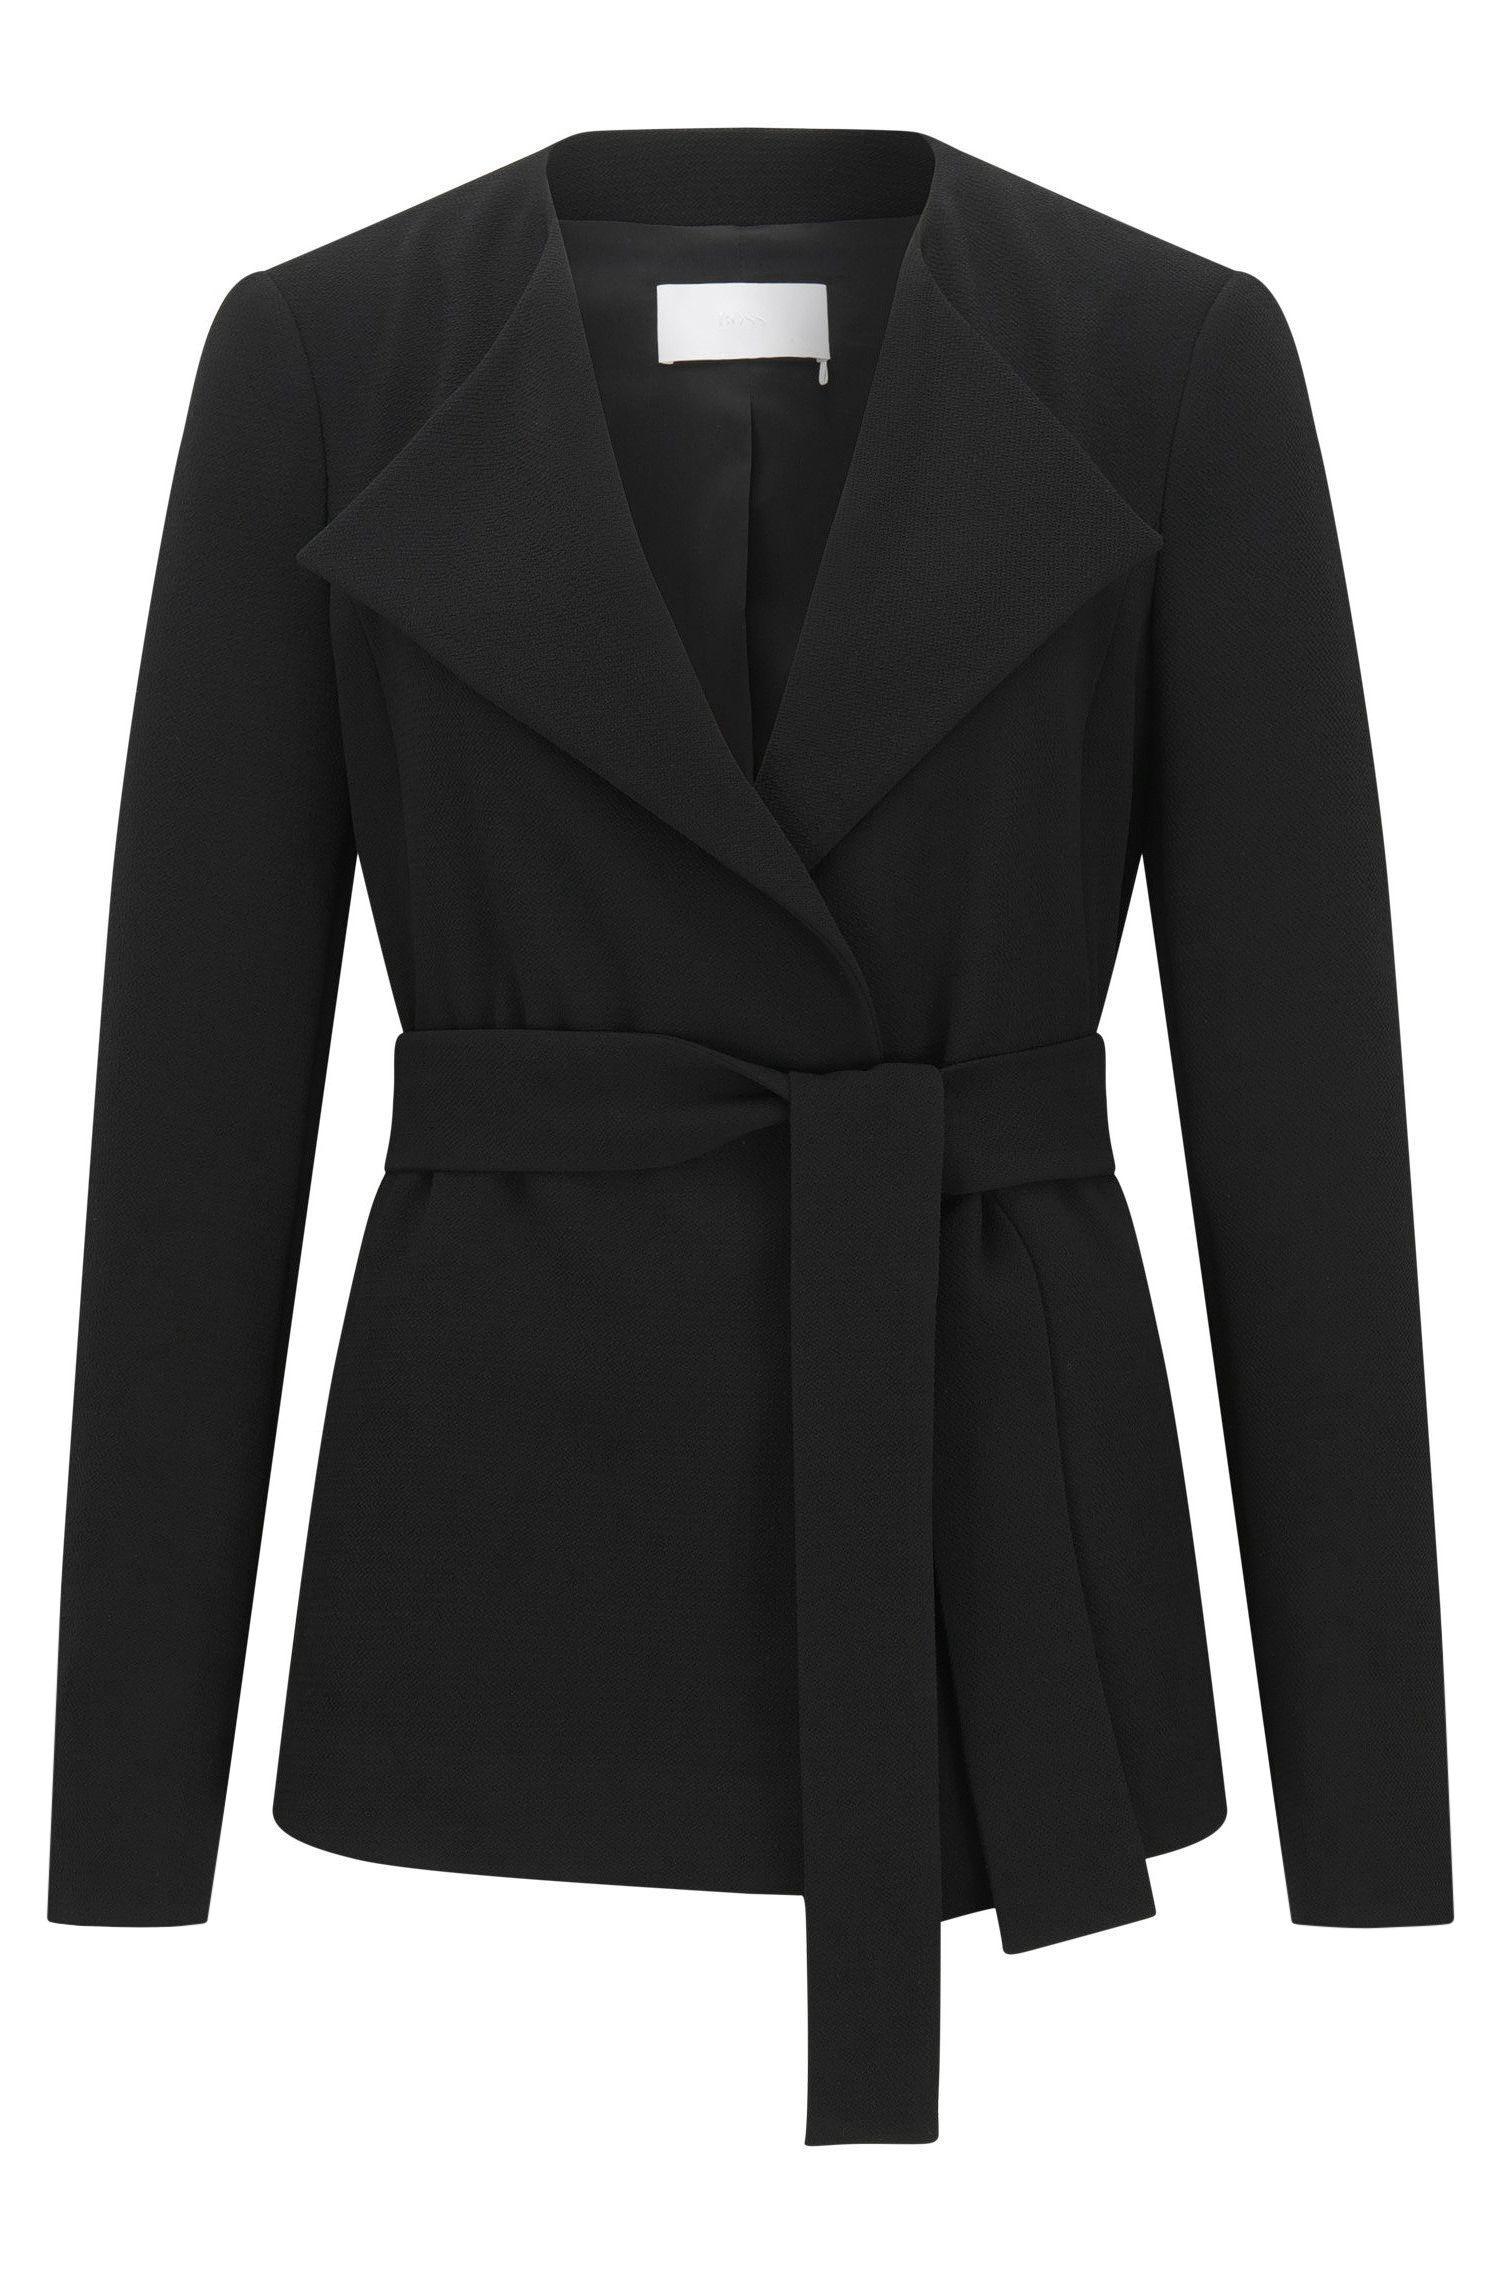 'Karelina' | Self-Tie Woven Jacket